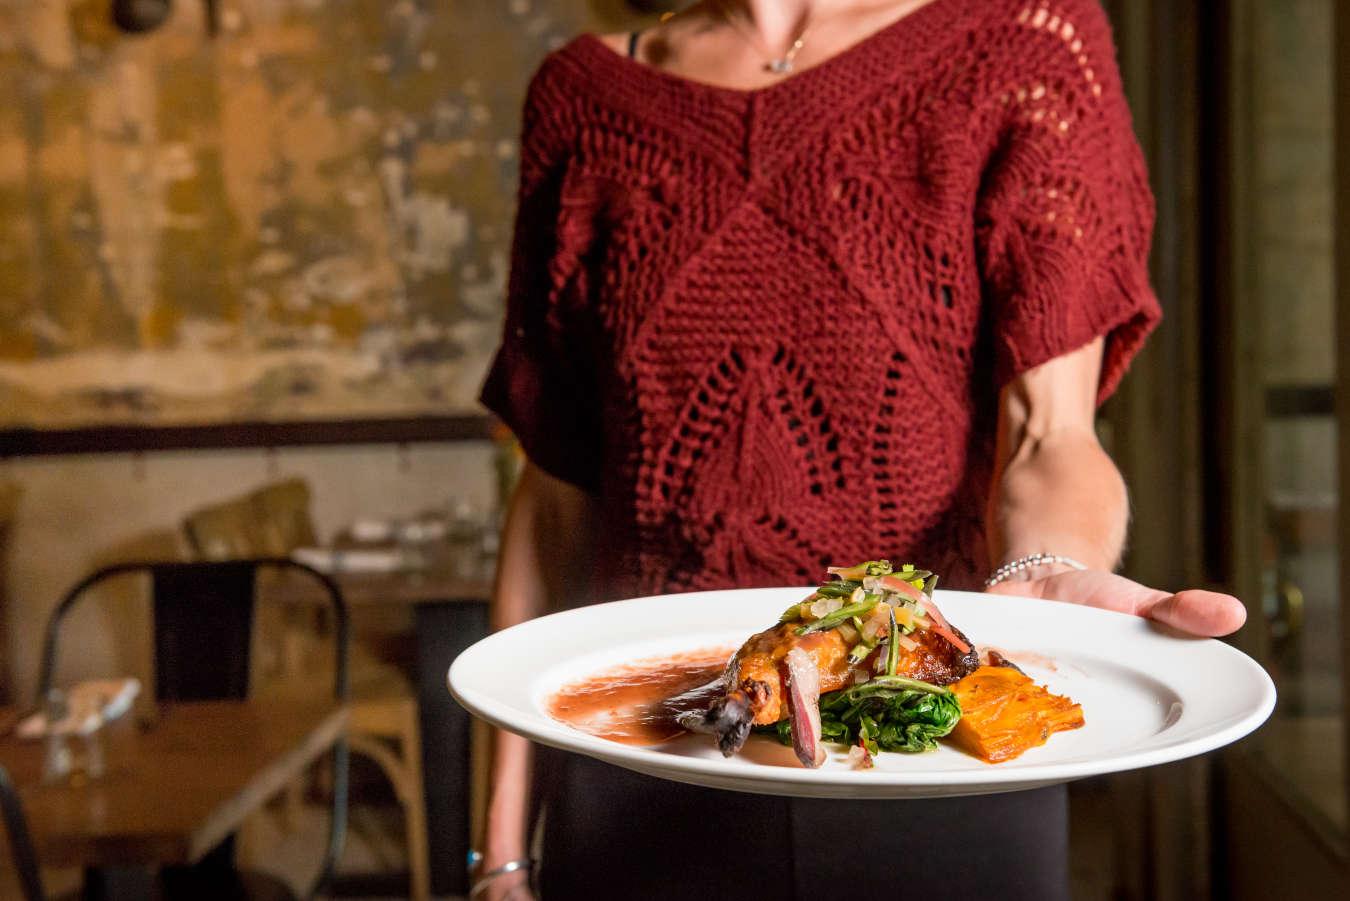 Plate of Food - Rhubarb